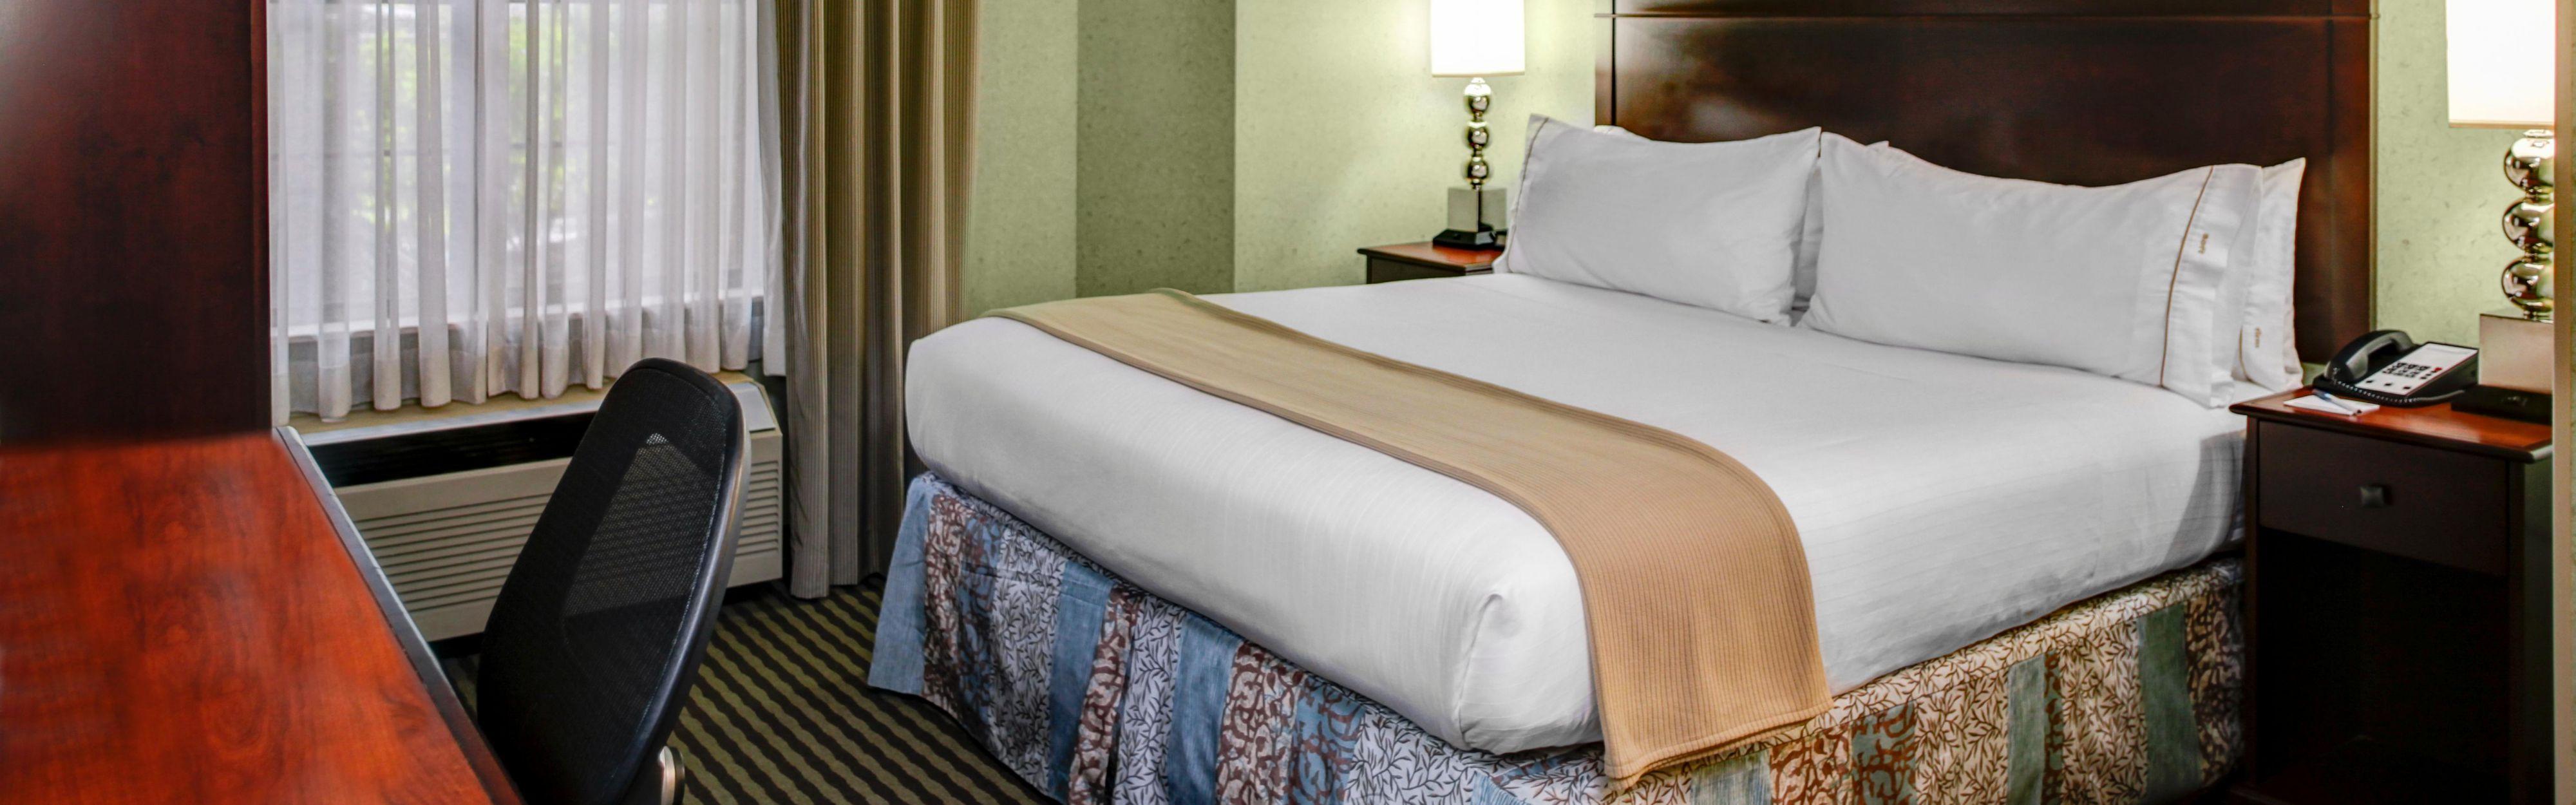 Holiday Inn Express & Suites Atlanta Buckhead image 1